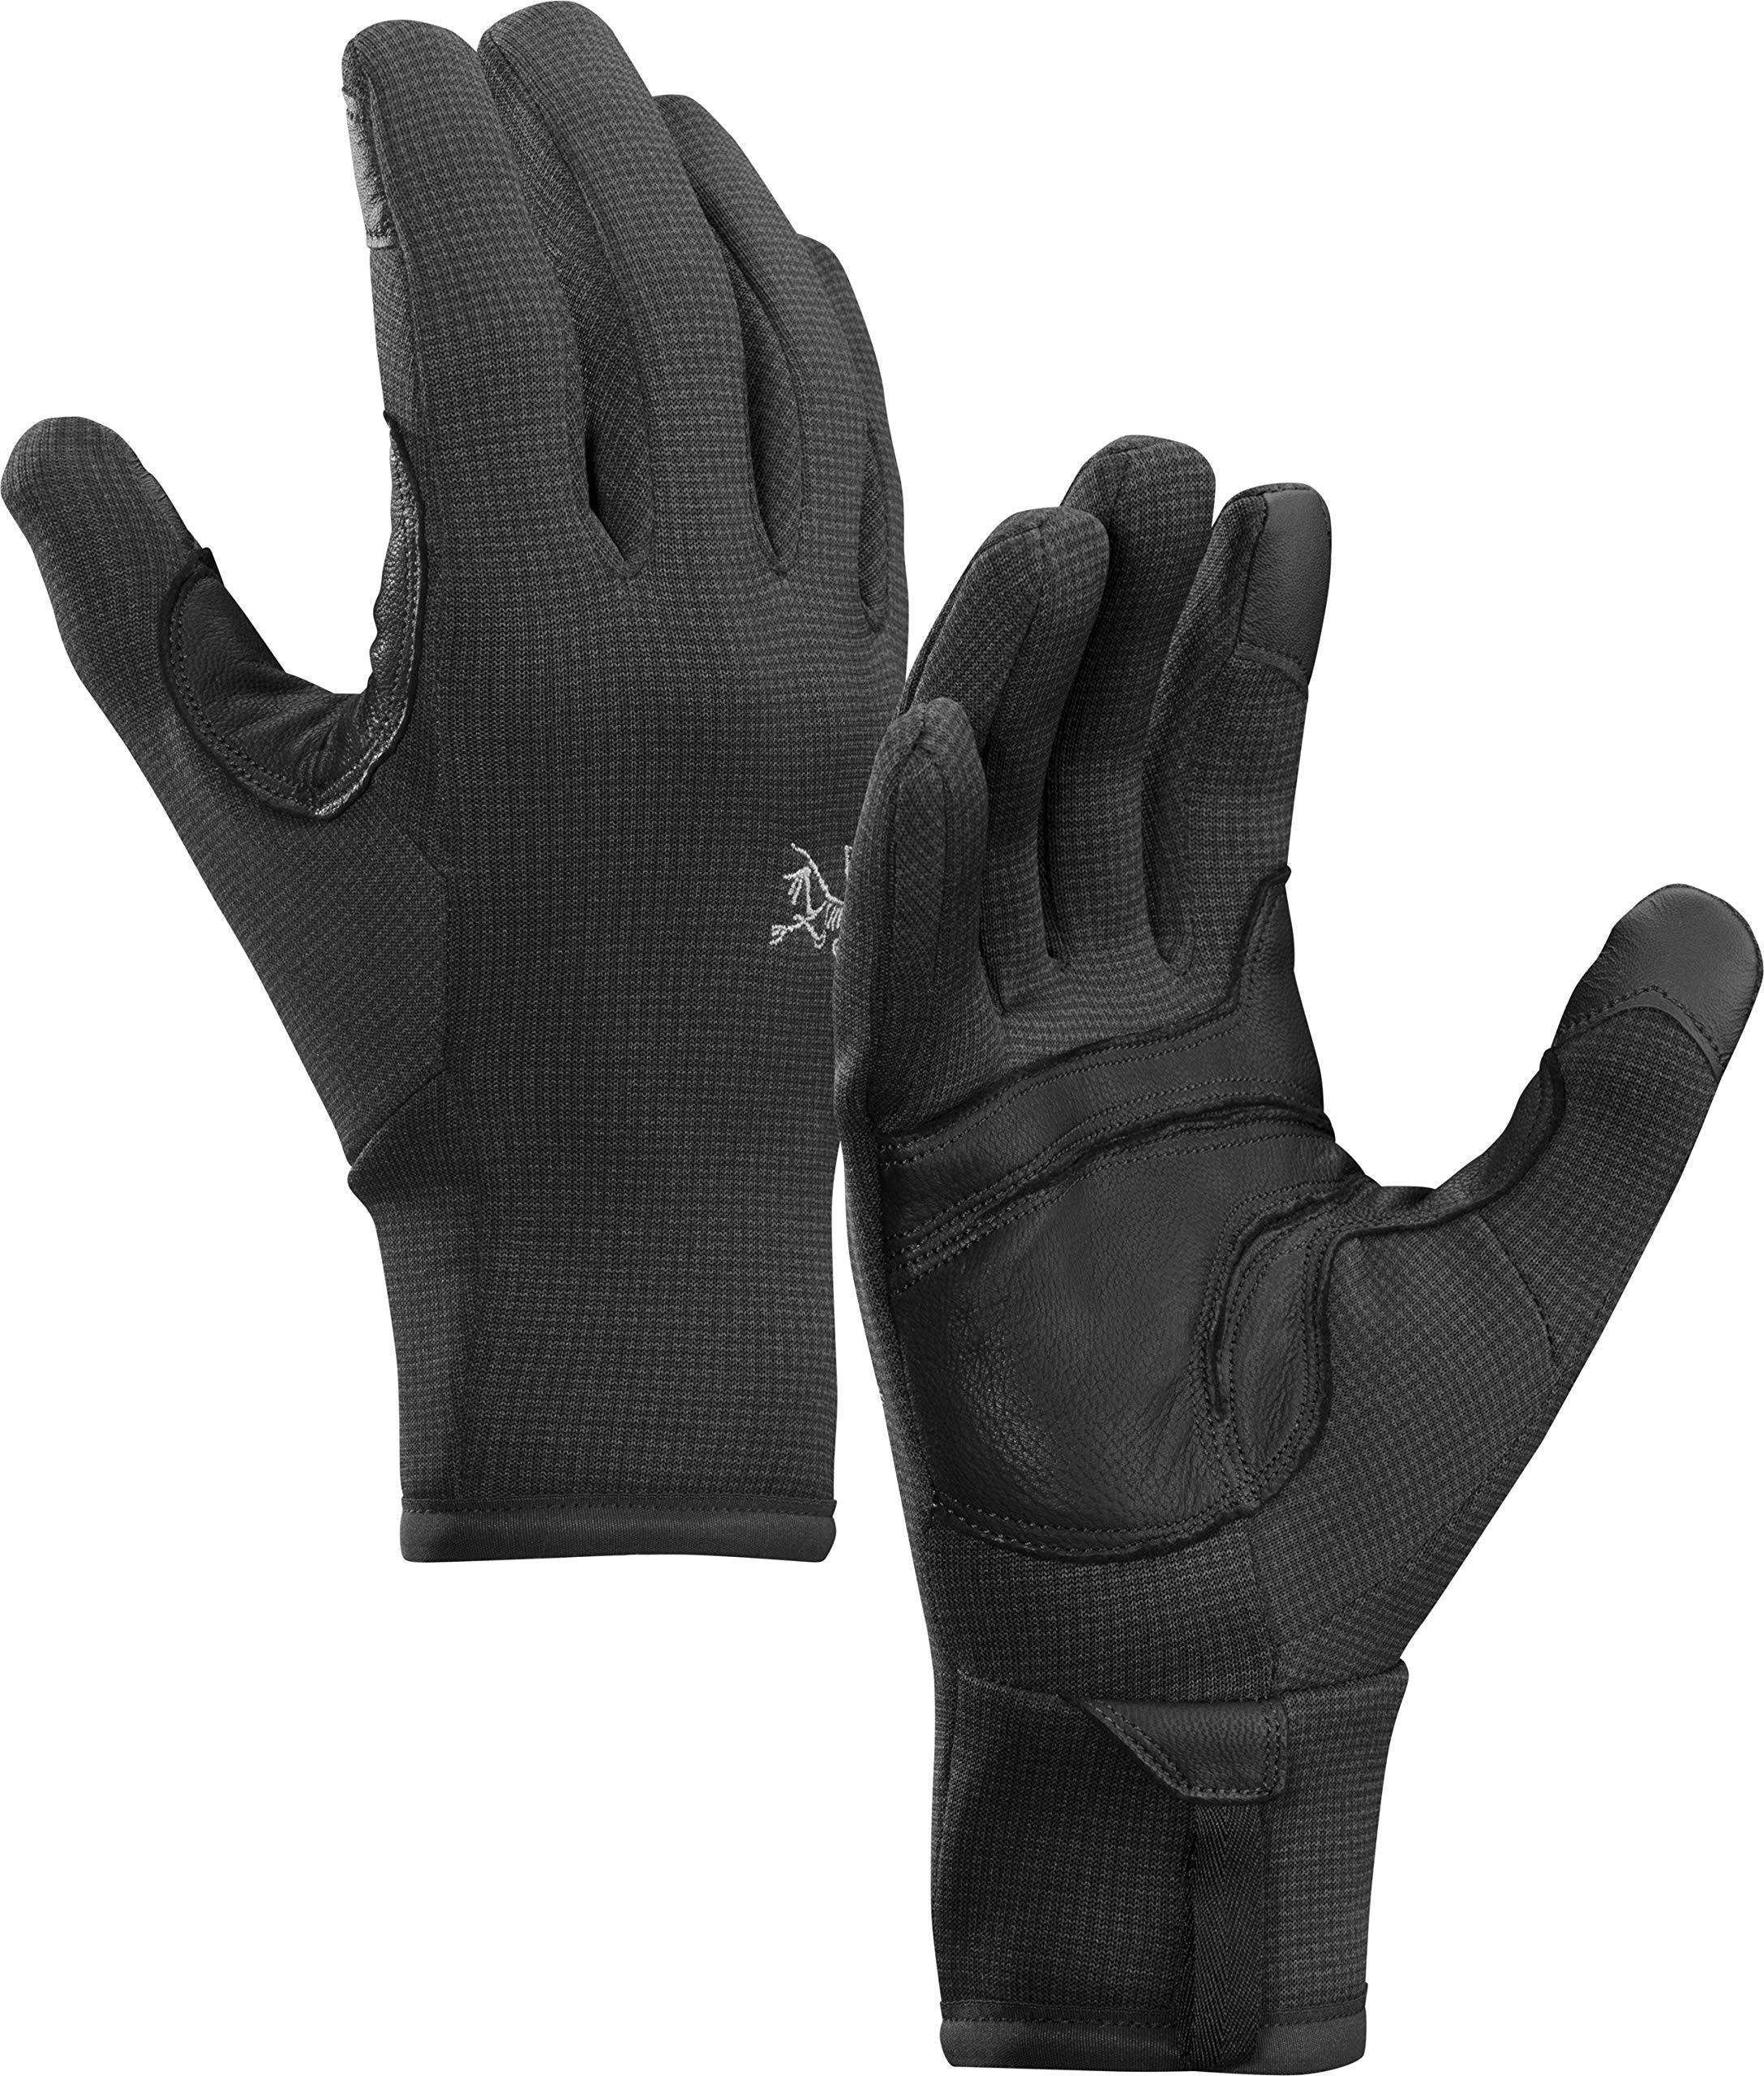 Arc'teryx Rivet Glove Black XL